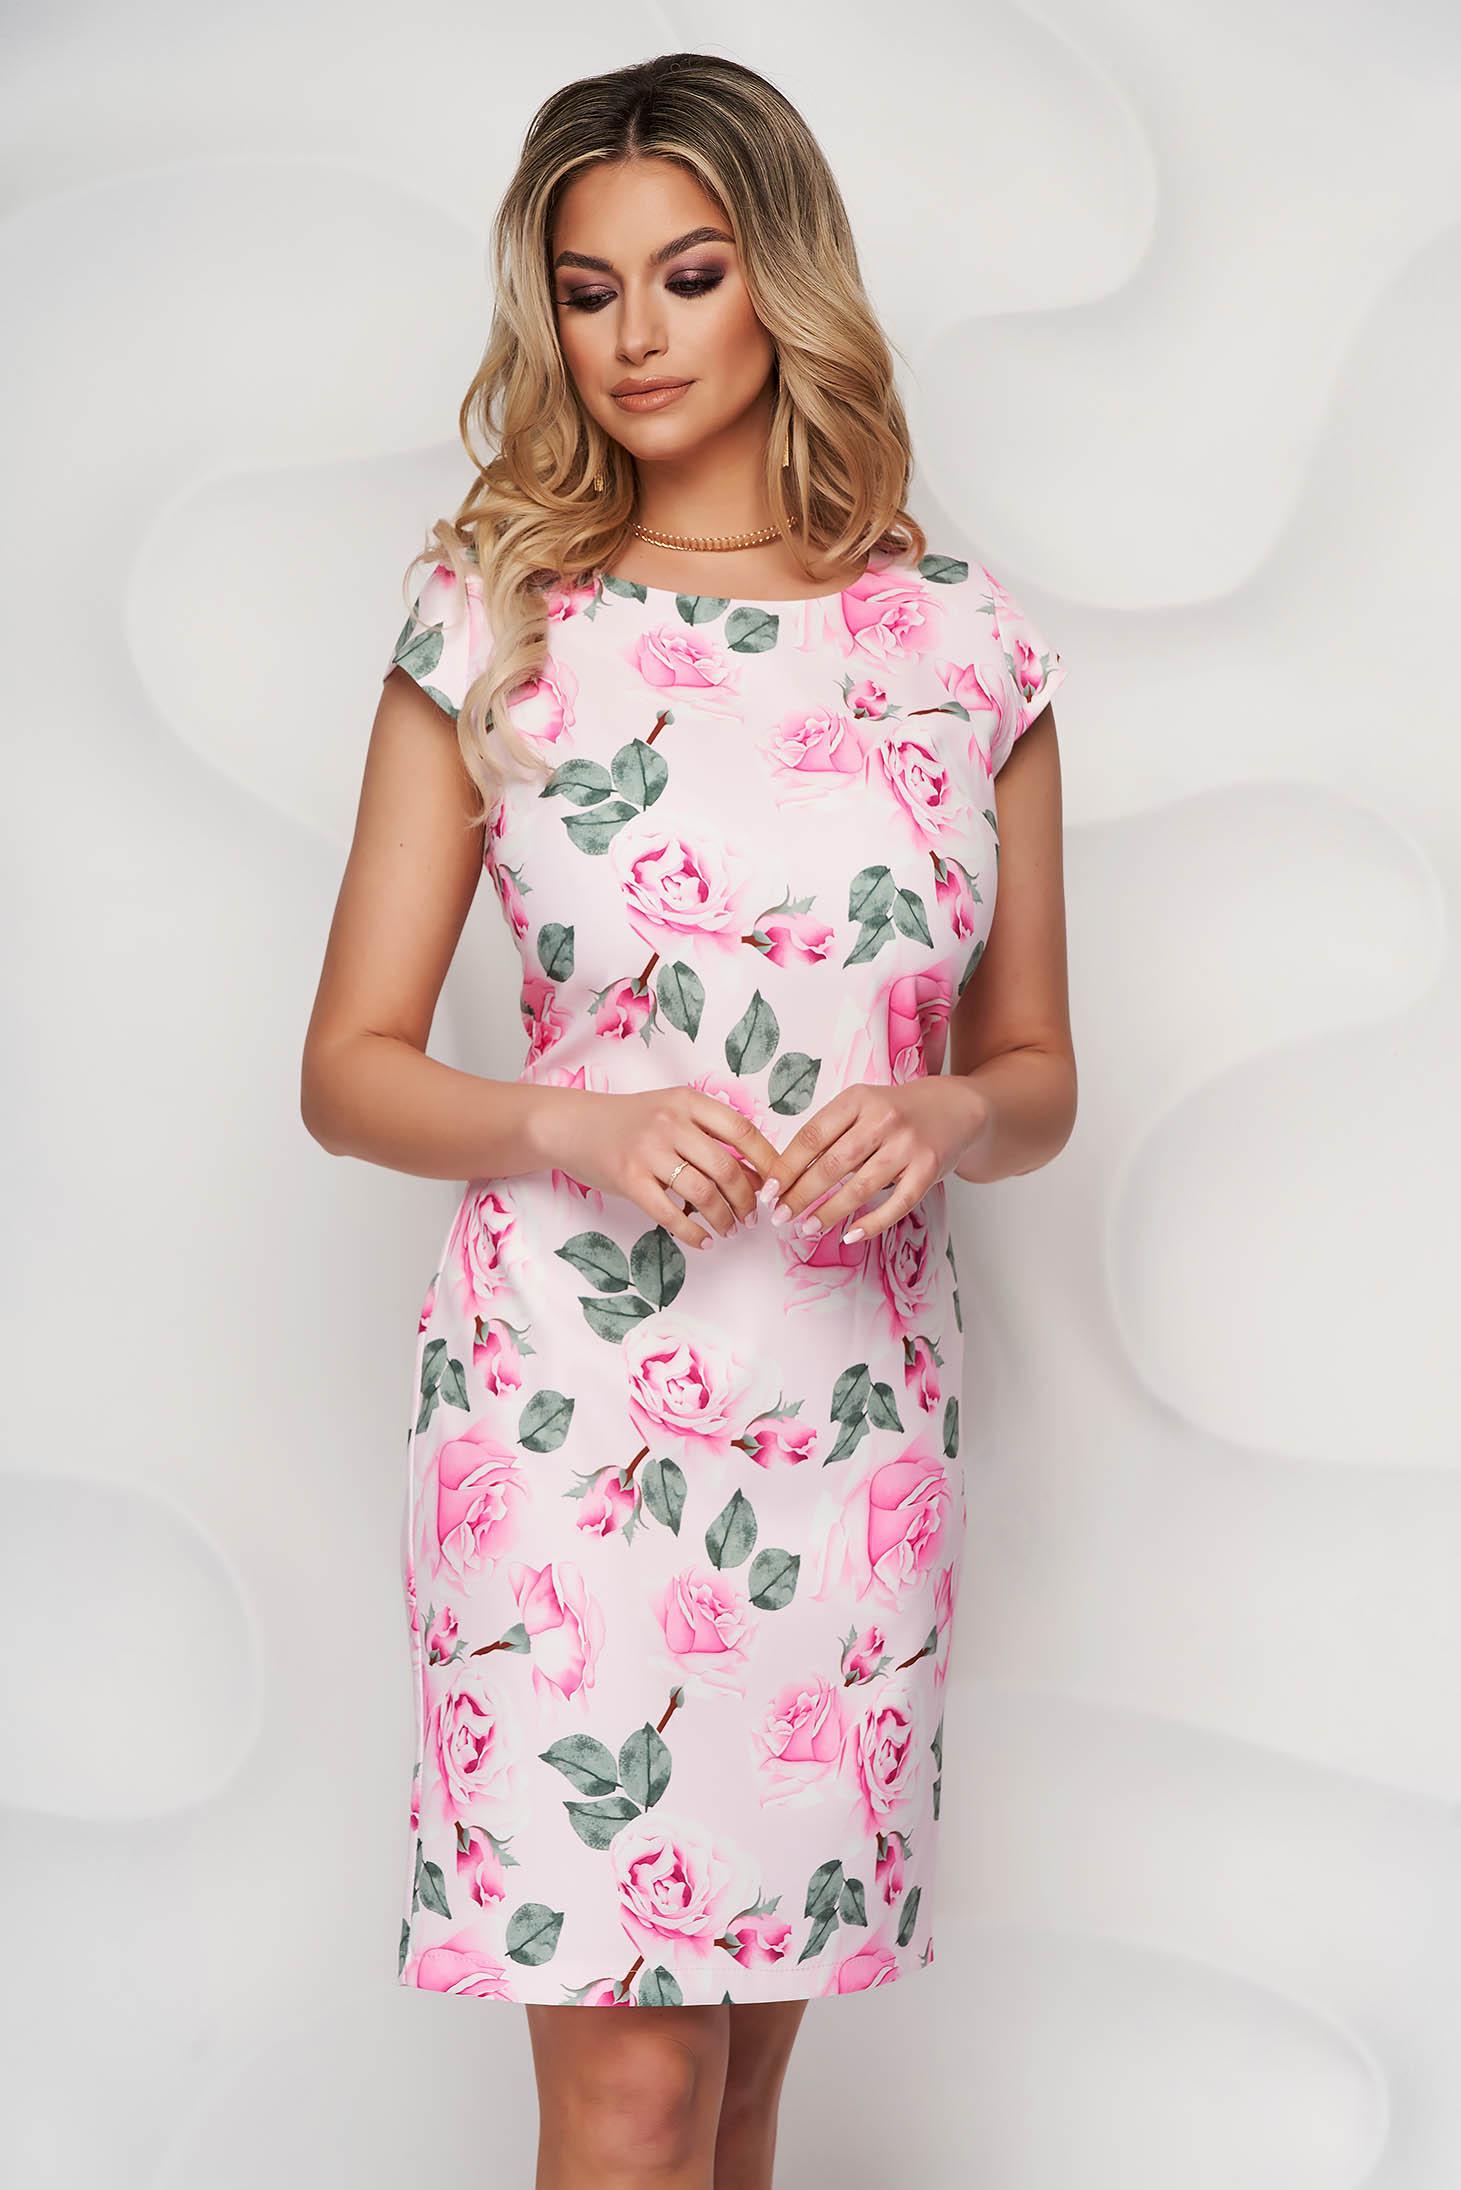 Rochie StarShinerS office scurta din stofa neelastica subtire cu un croi drept cu imprimeu floral unic